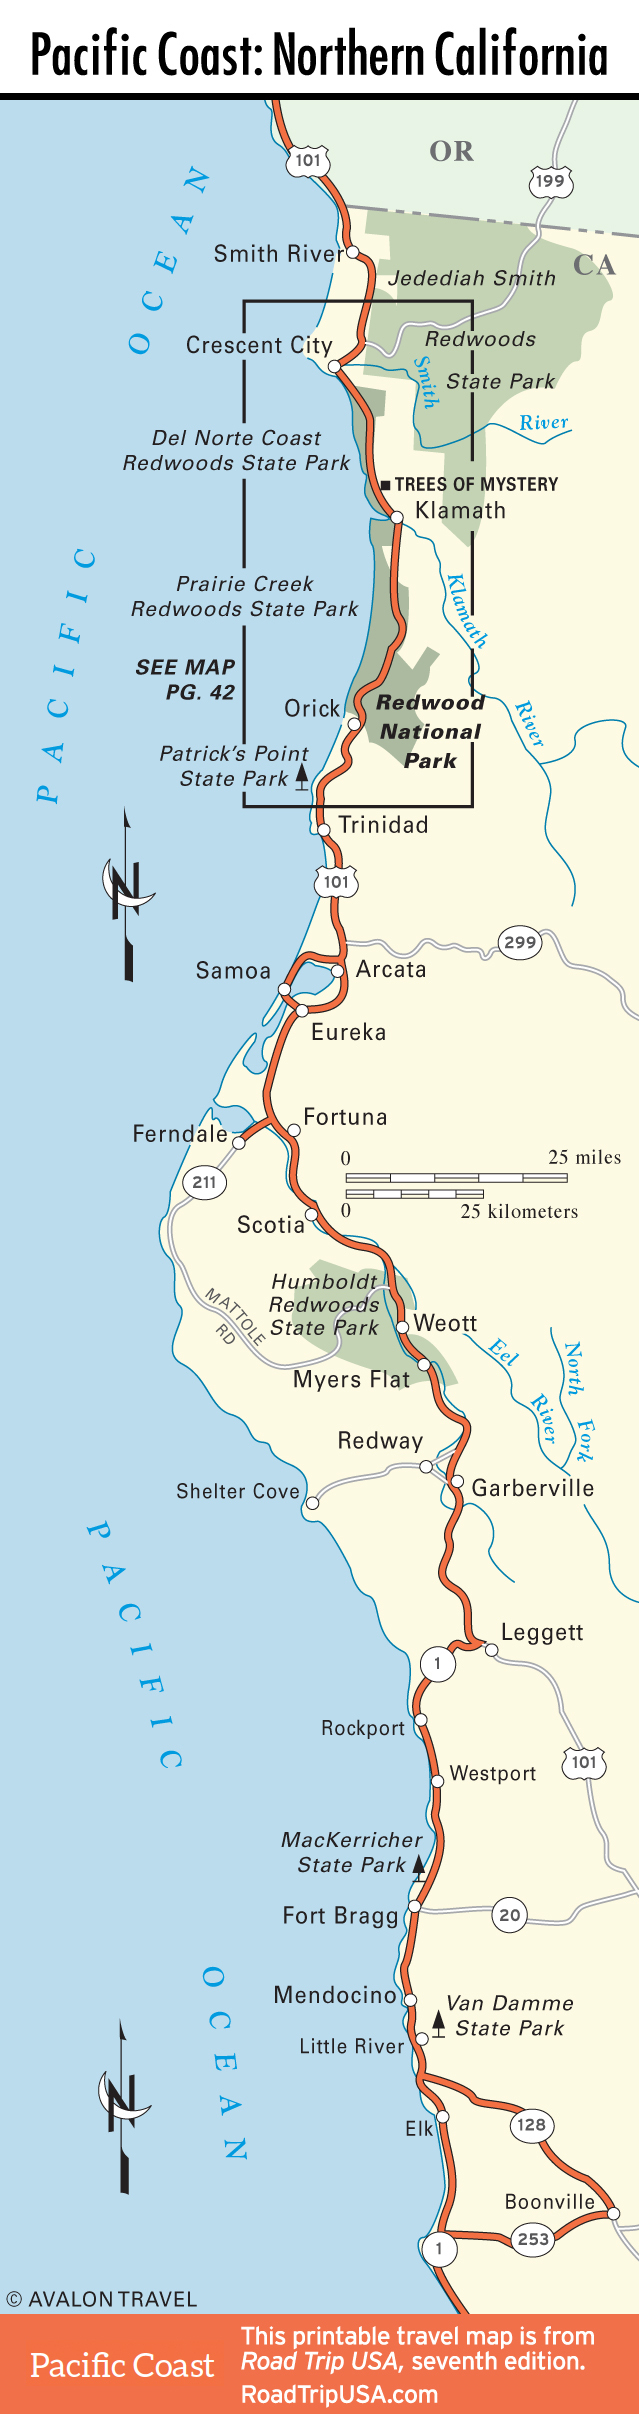 California National Parks California Road Map Map California - National Parks In Northern California Map